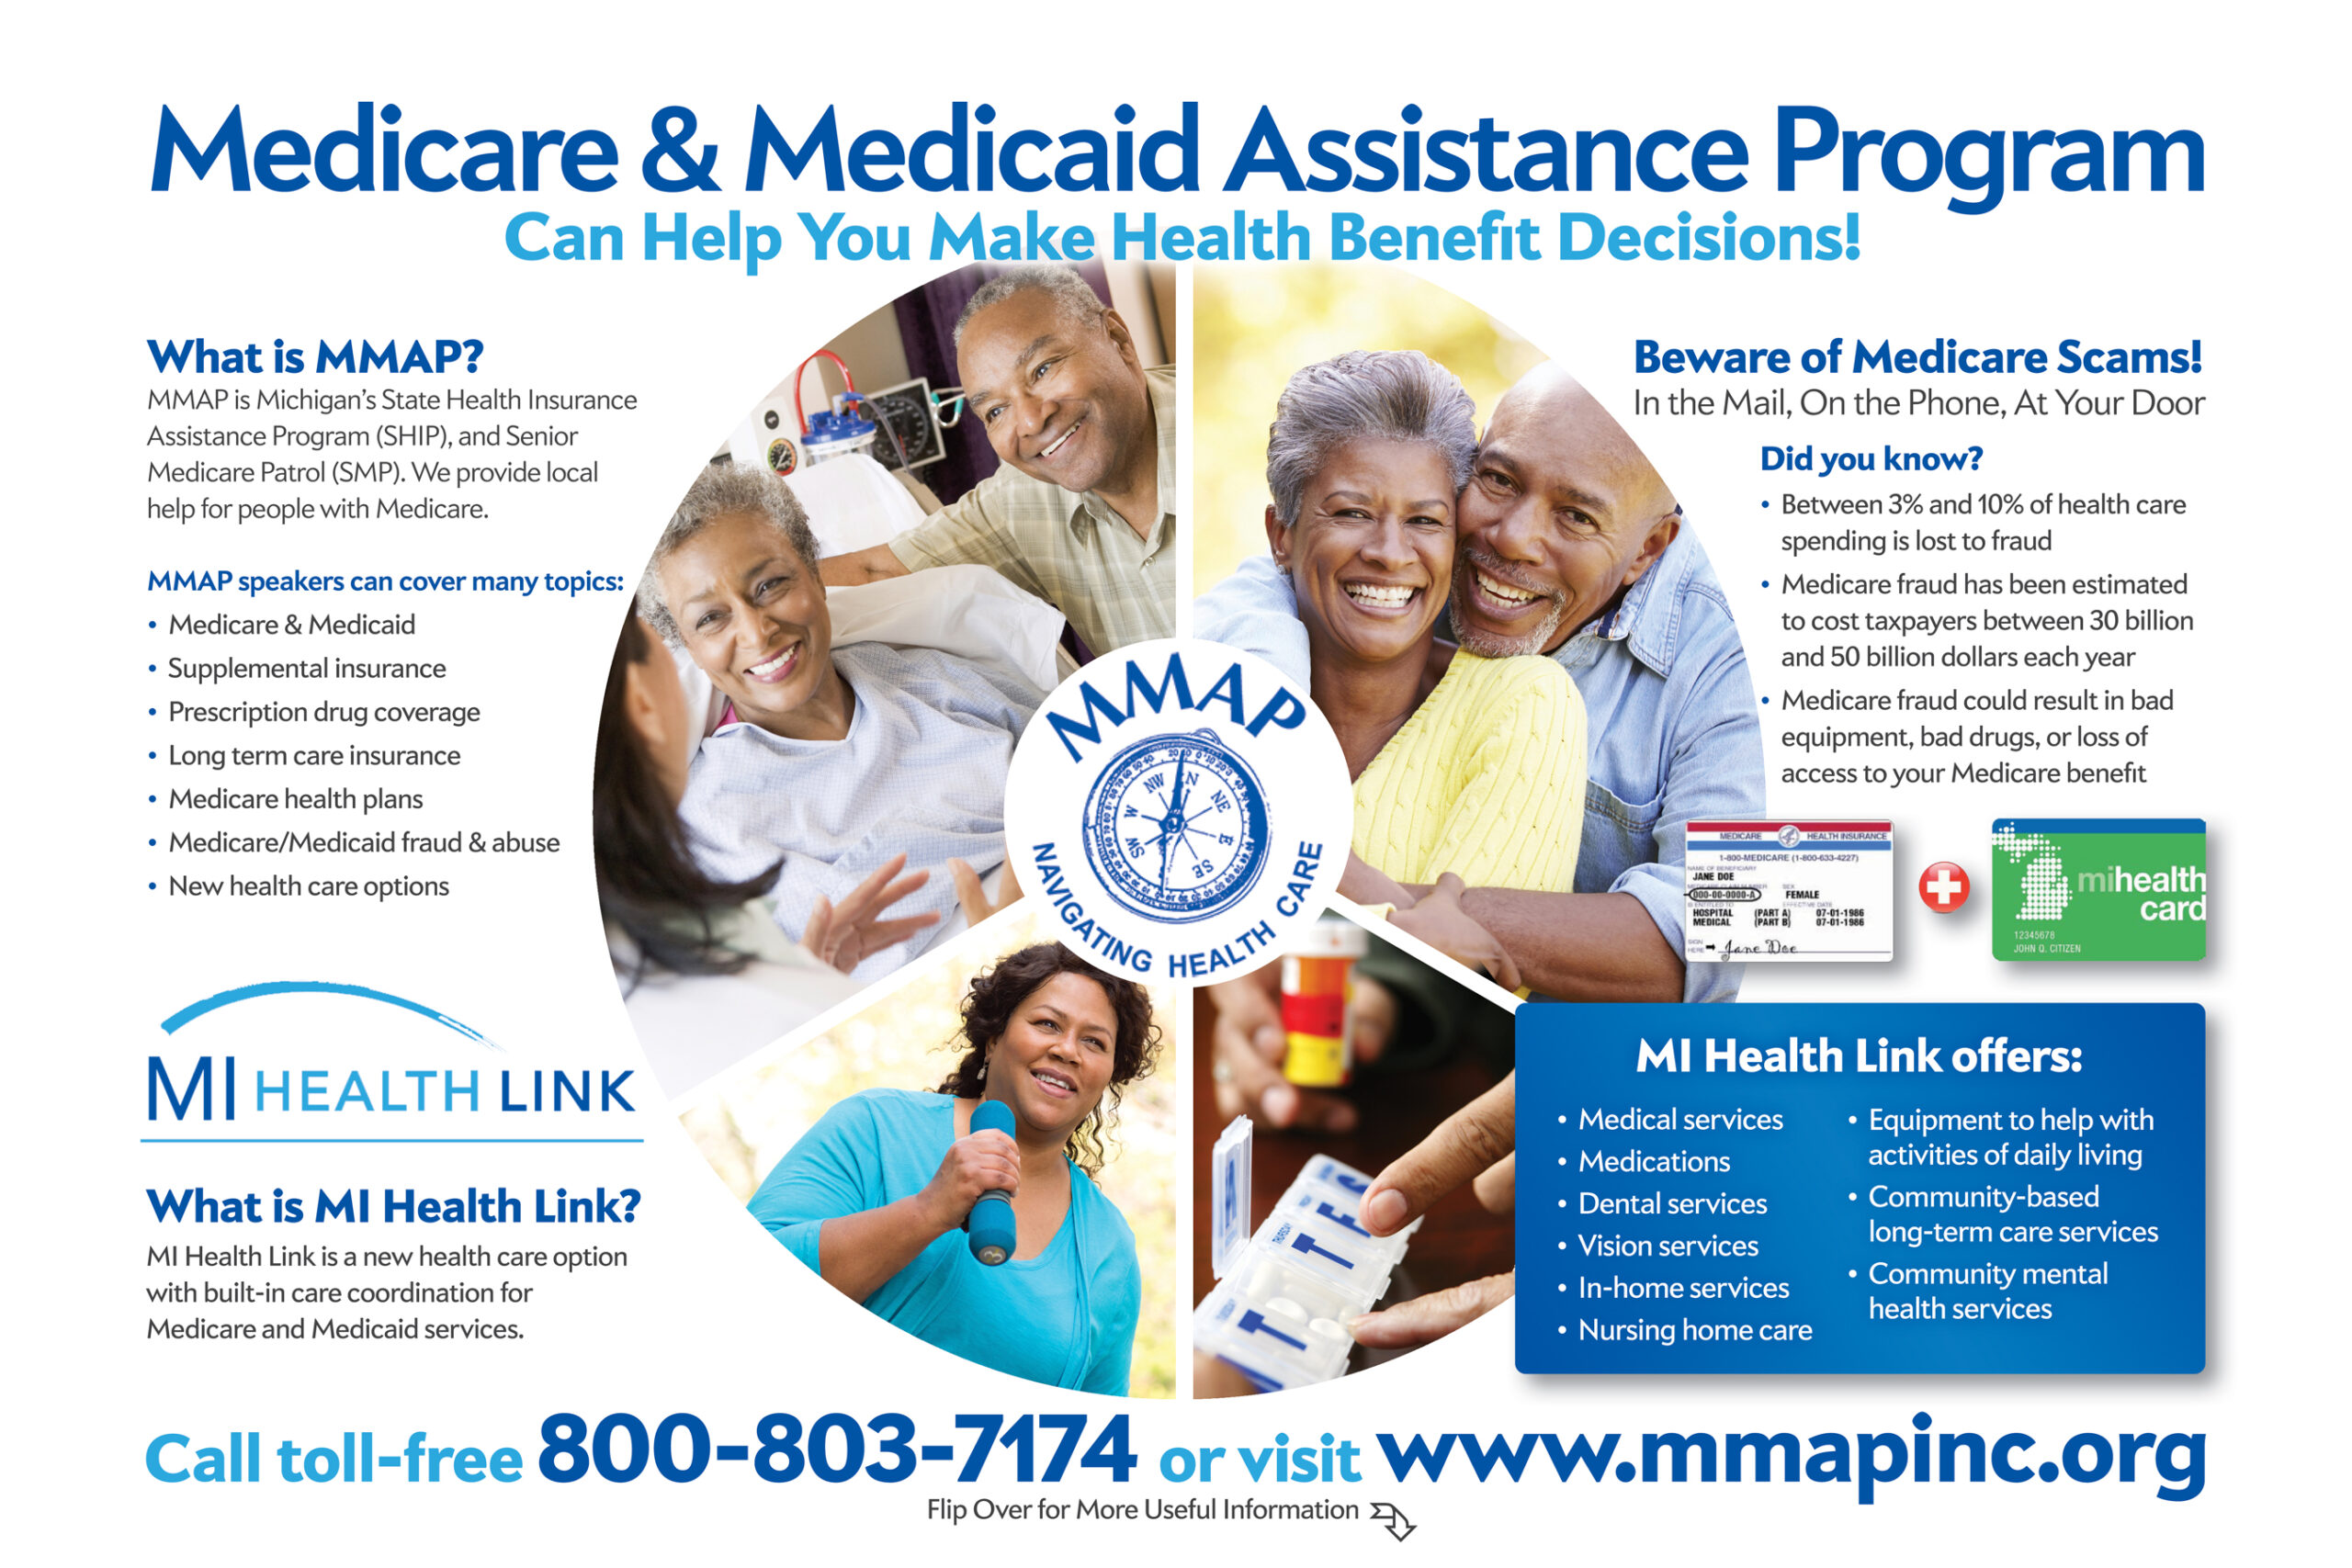 Medicare & Medicaid Assistance Program information graphic